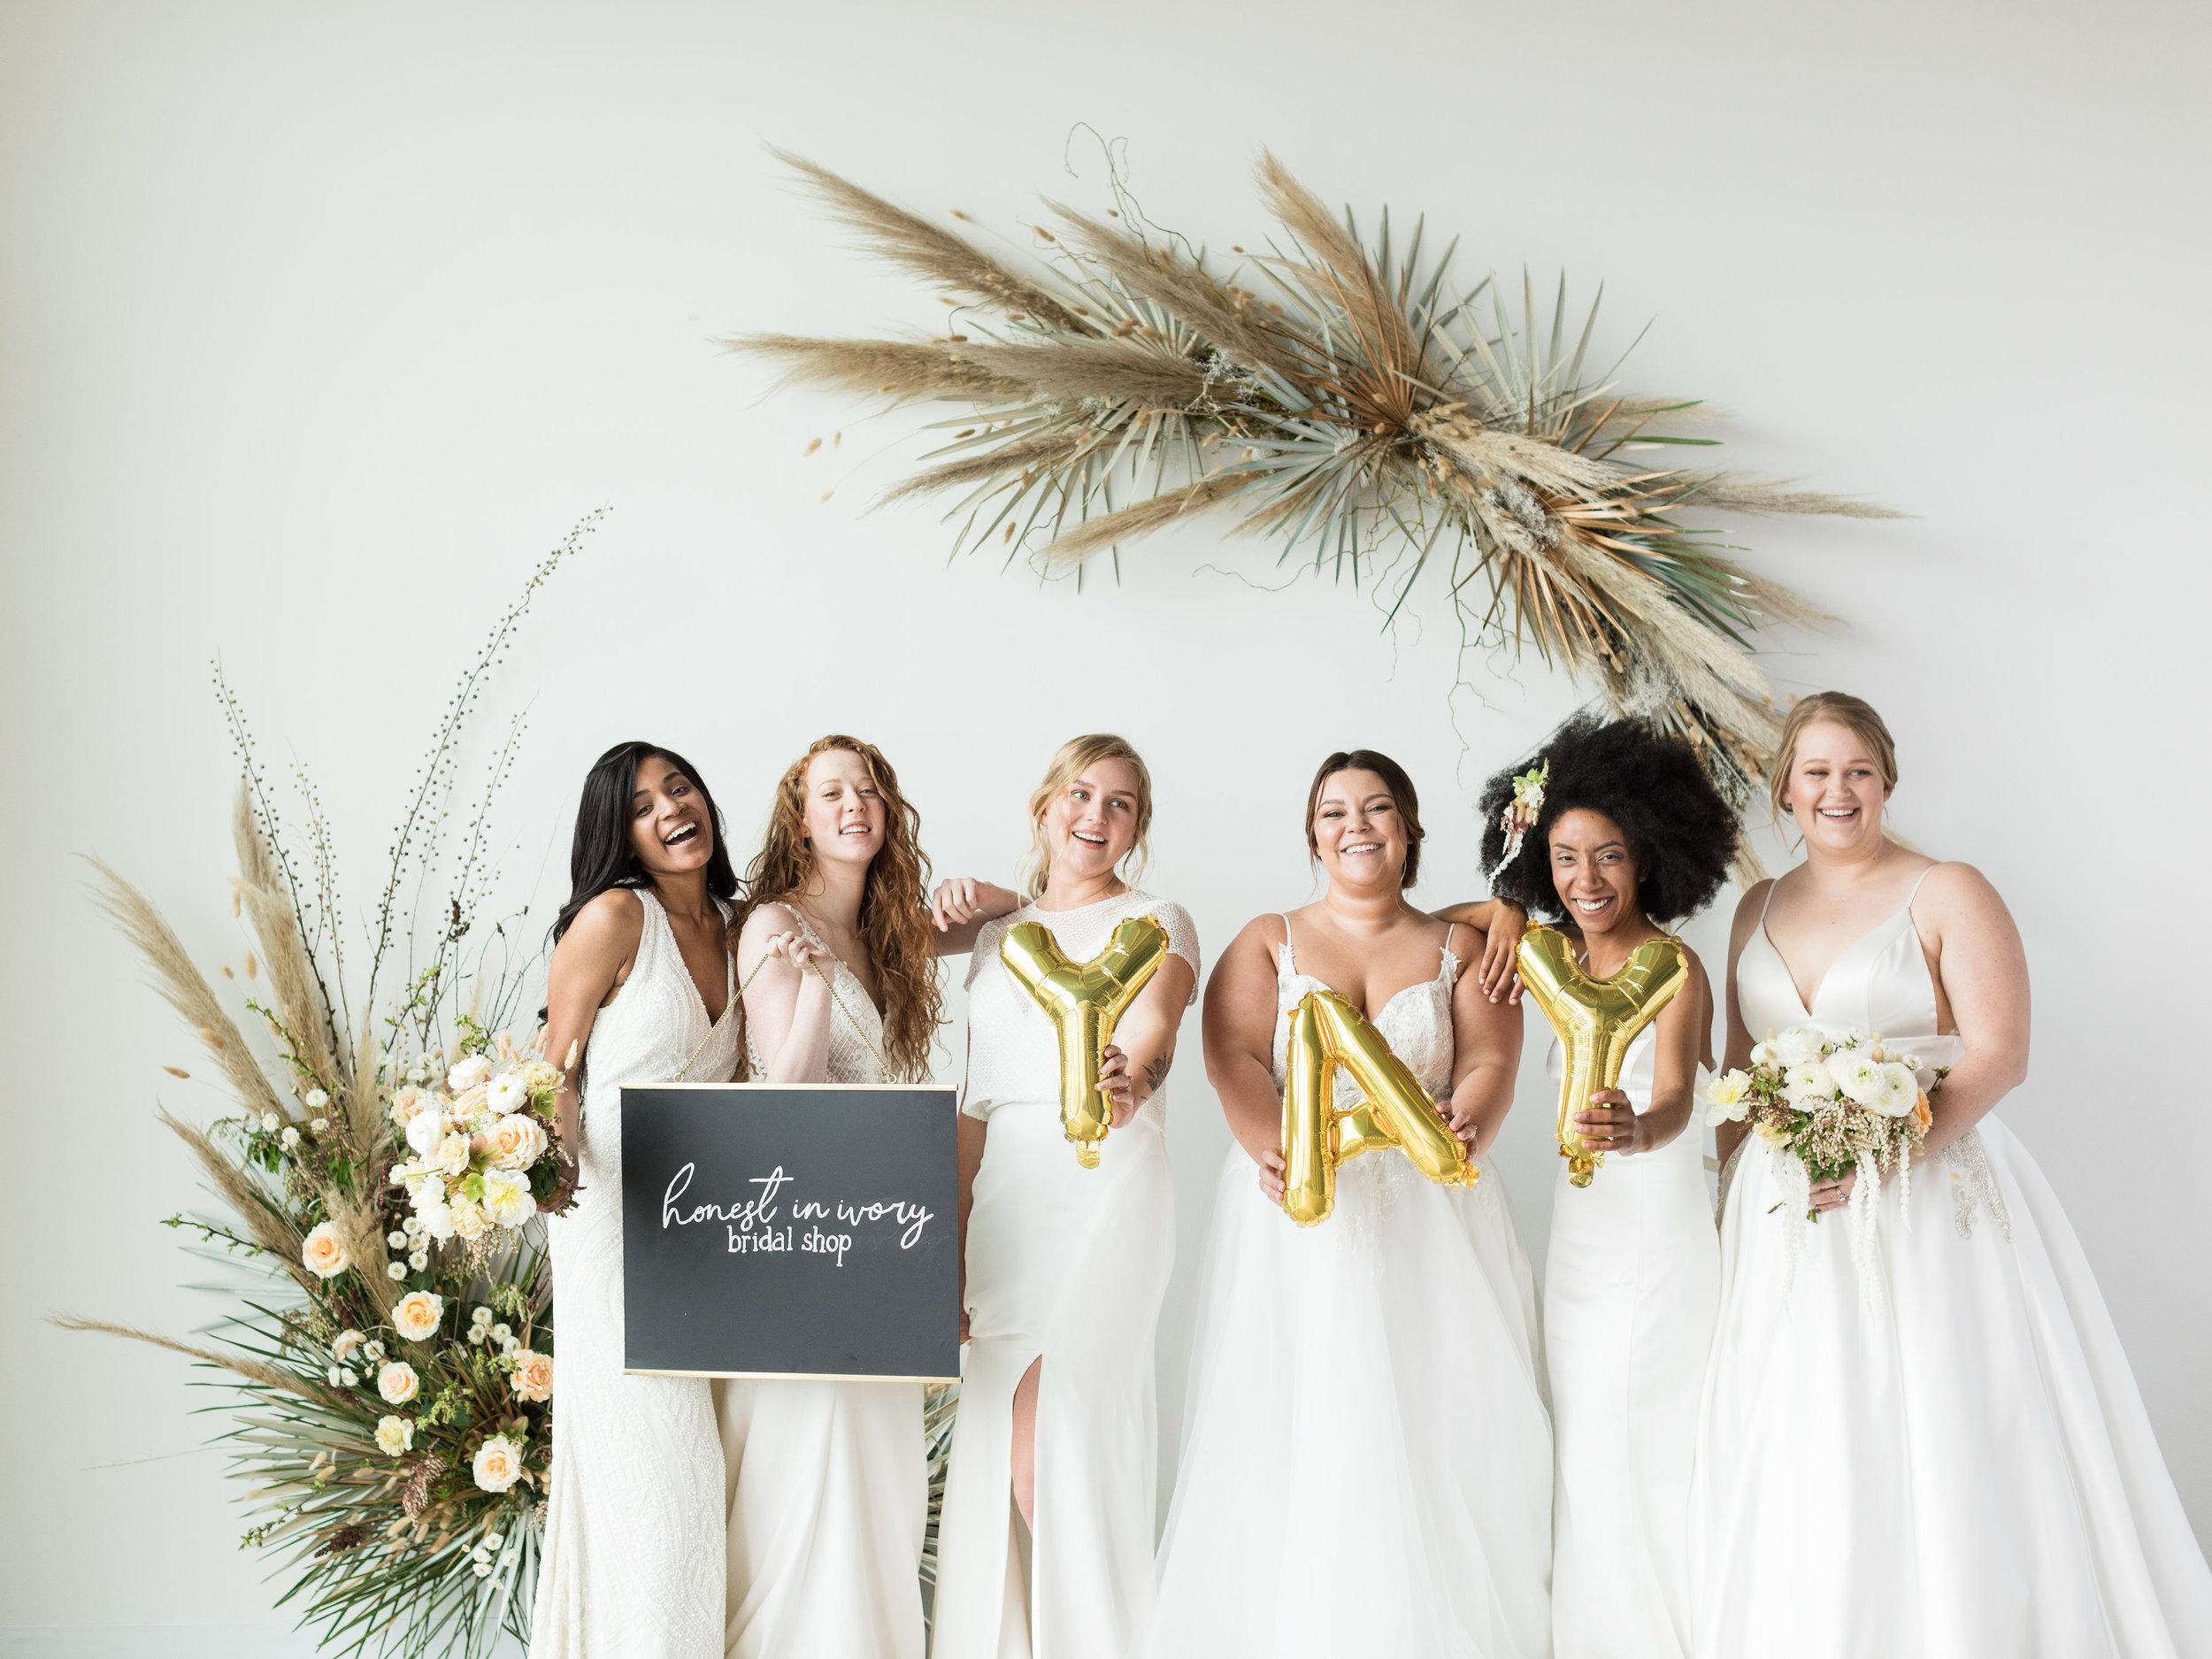 editorial_honest_ivory_sage_scarlet_wedding_bridal_dress_photography-78.JPG